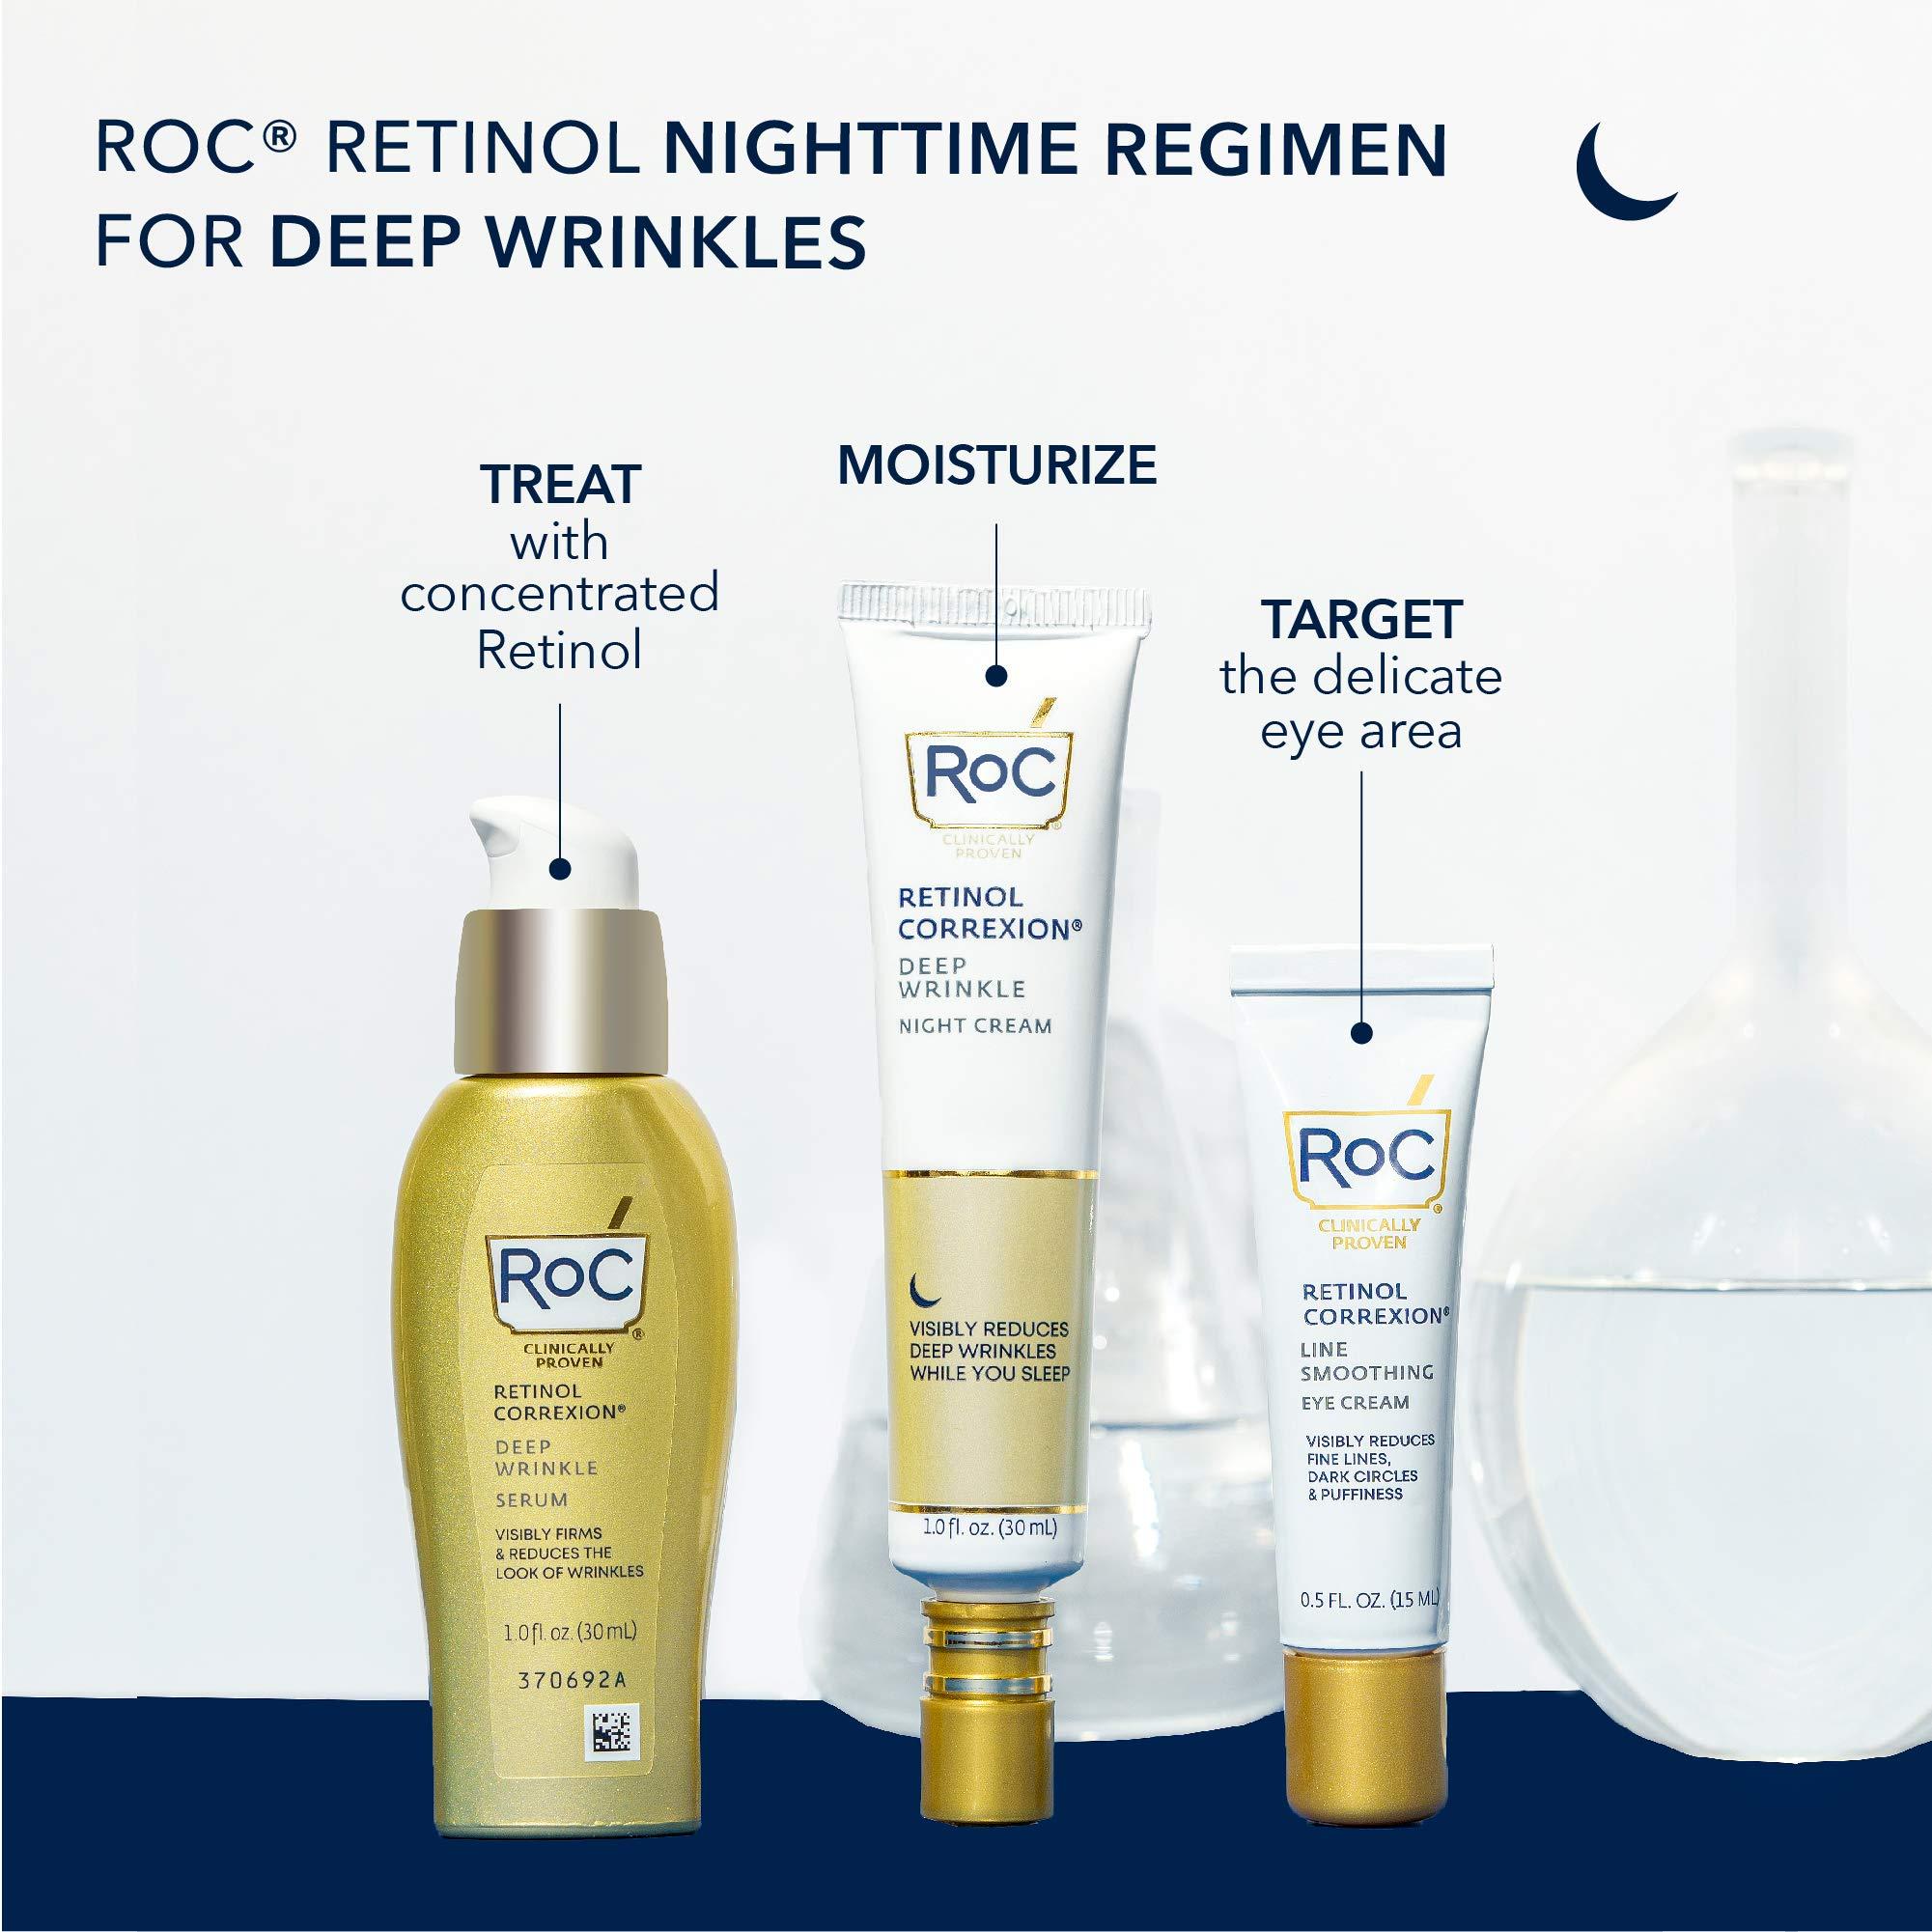 RoC Retinol Correxion Deep Wrinkle Anti-Aging Retinol Night Cream, 1 Ounce (Packaging May Vary) Retinol Moisturizer for Face, Wrinkle Cream for Face